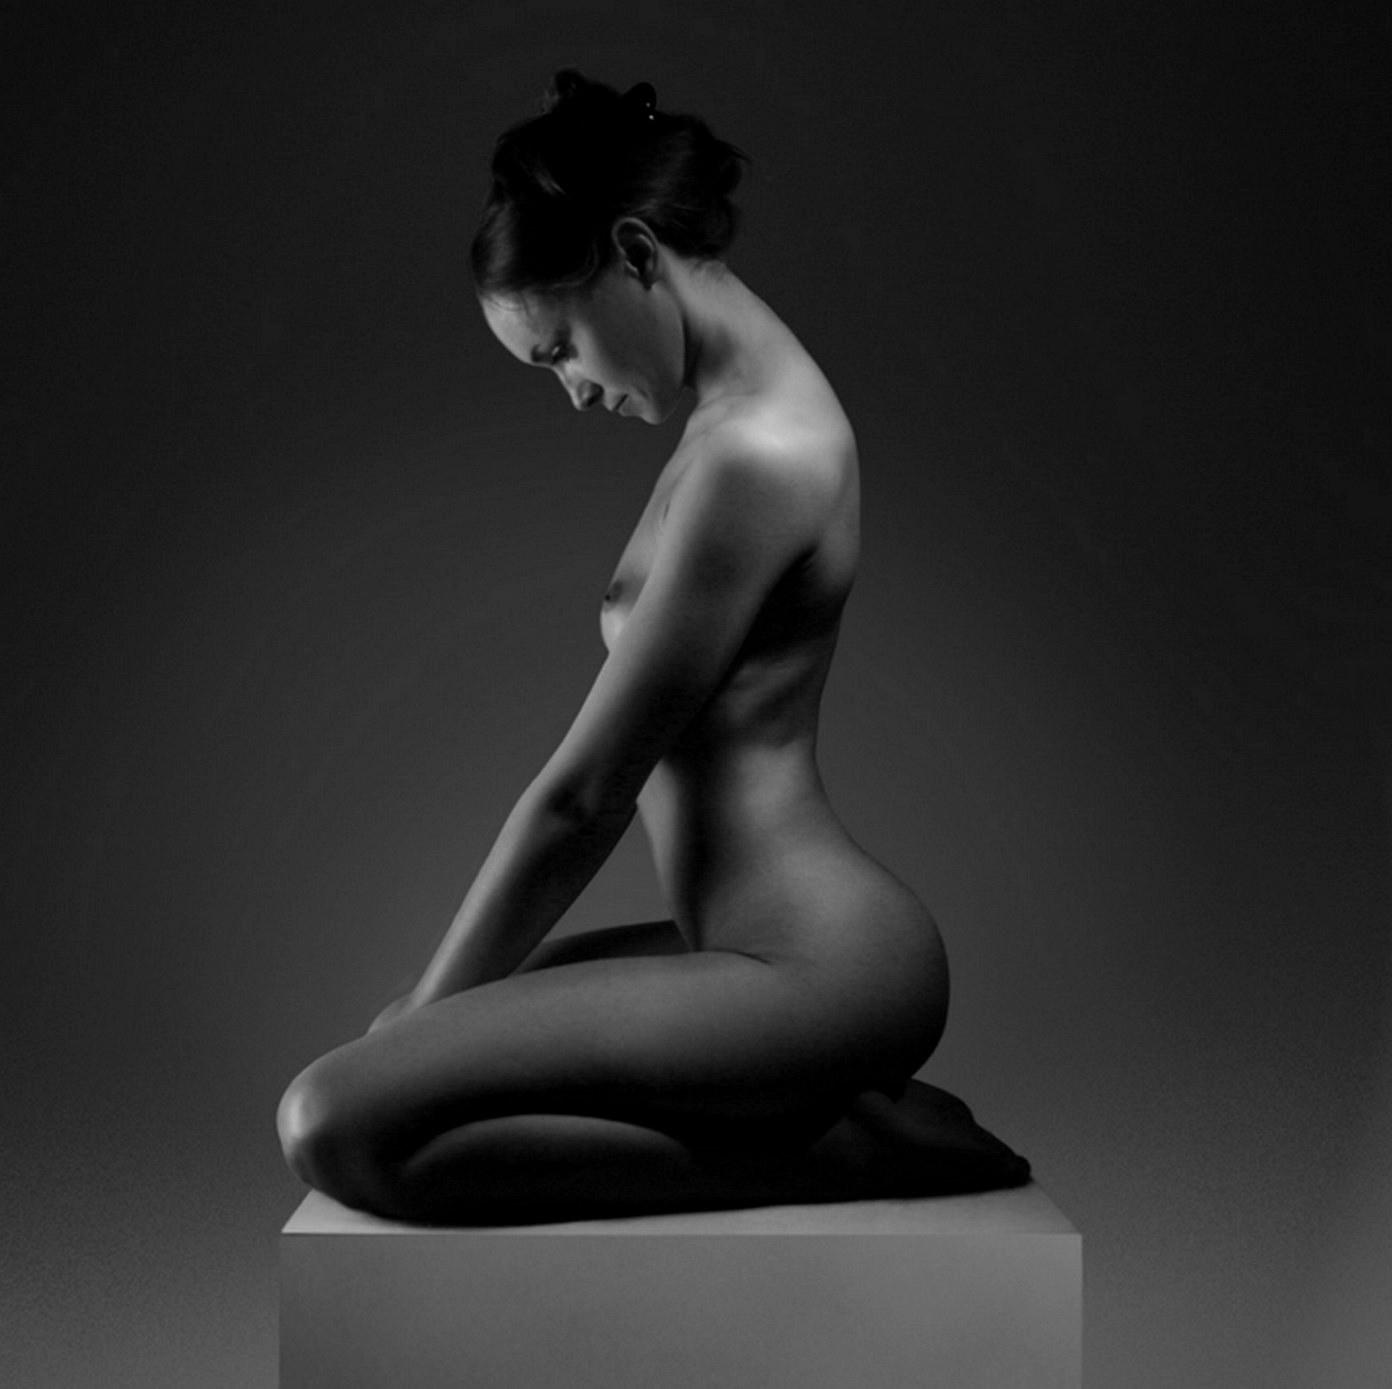 Desnudos Art Sticos En Fotograf A De Je Warda